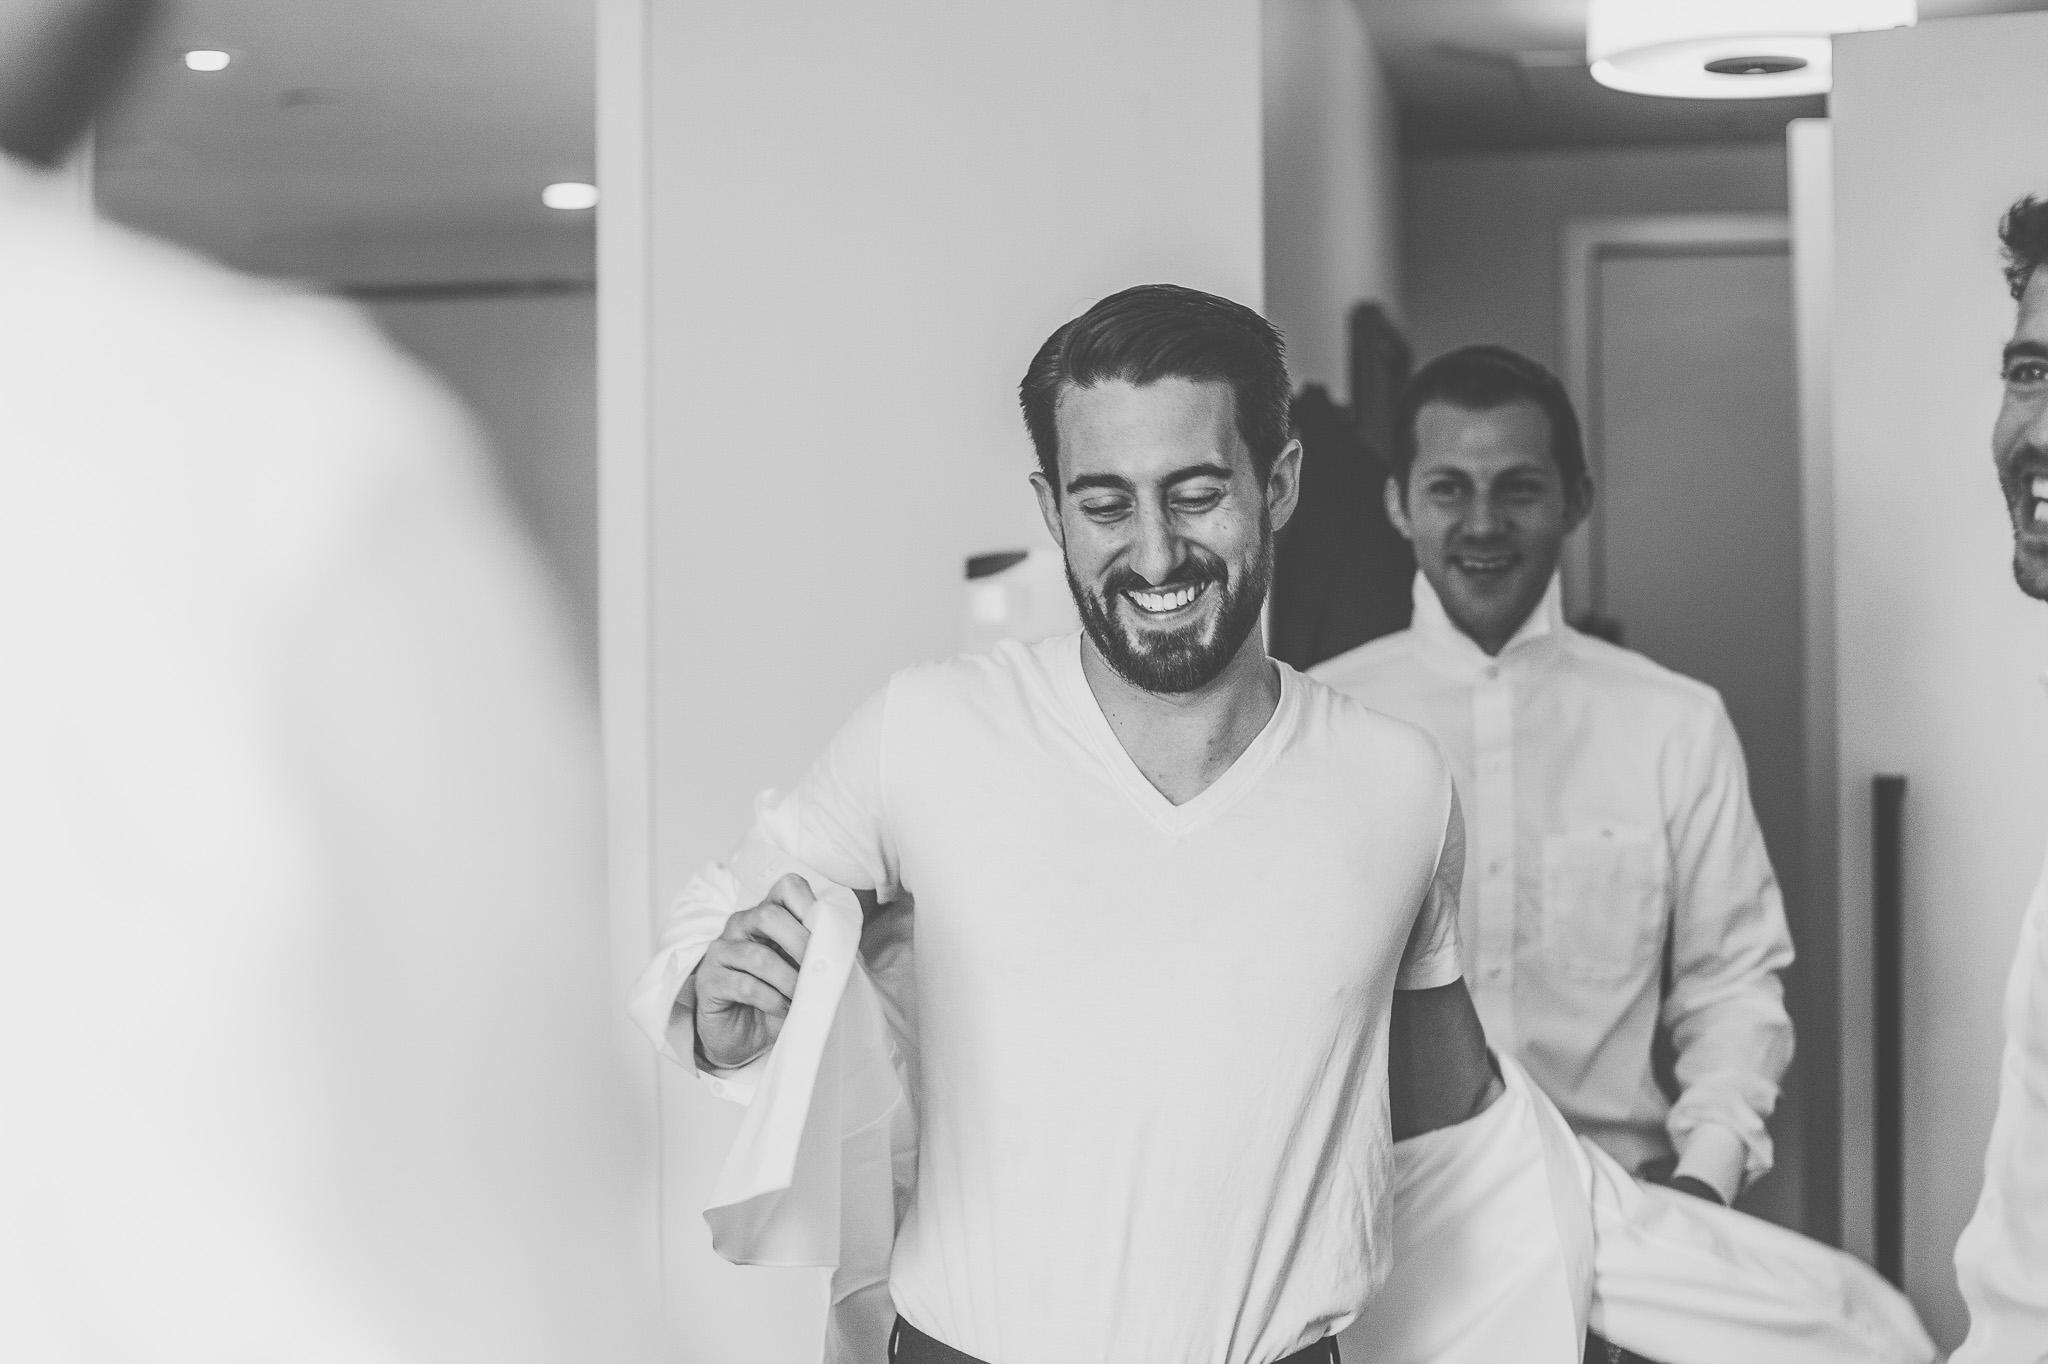 Downtown Toronto wedding, Toronto Wedding, Toronto Wedding Photographer, Downtown Toronto, Toronto Photographer, Berkeley Church, Berkeley Events, Berkeley fieldhouse, Groom, Groom getting ready, bowtie, cigar, groom getting dressed